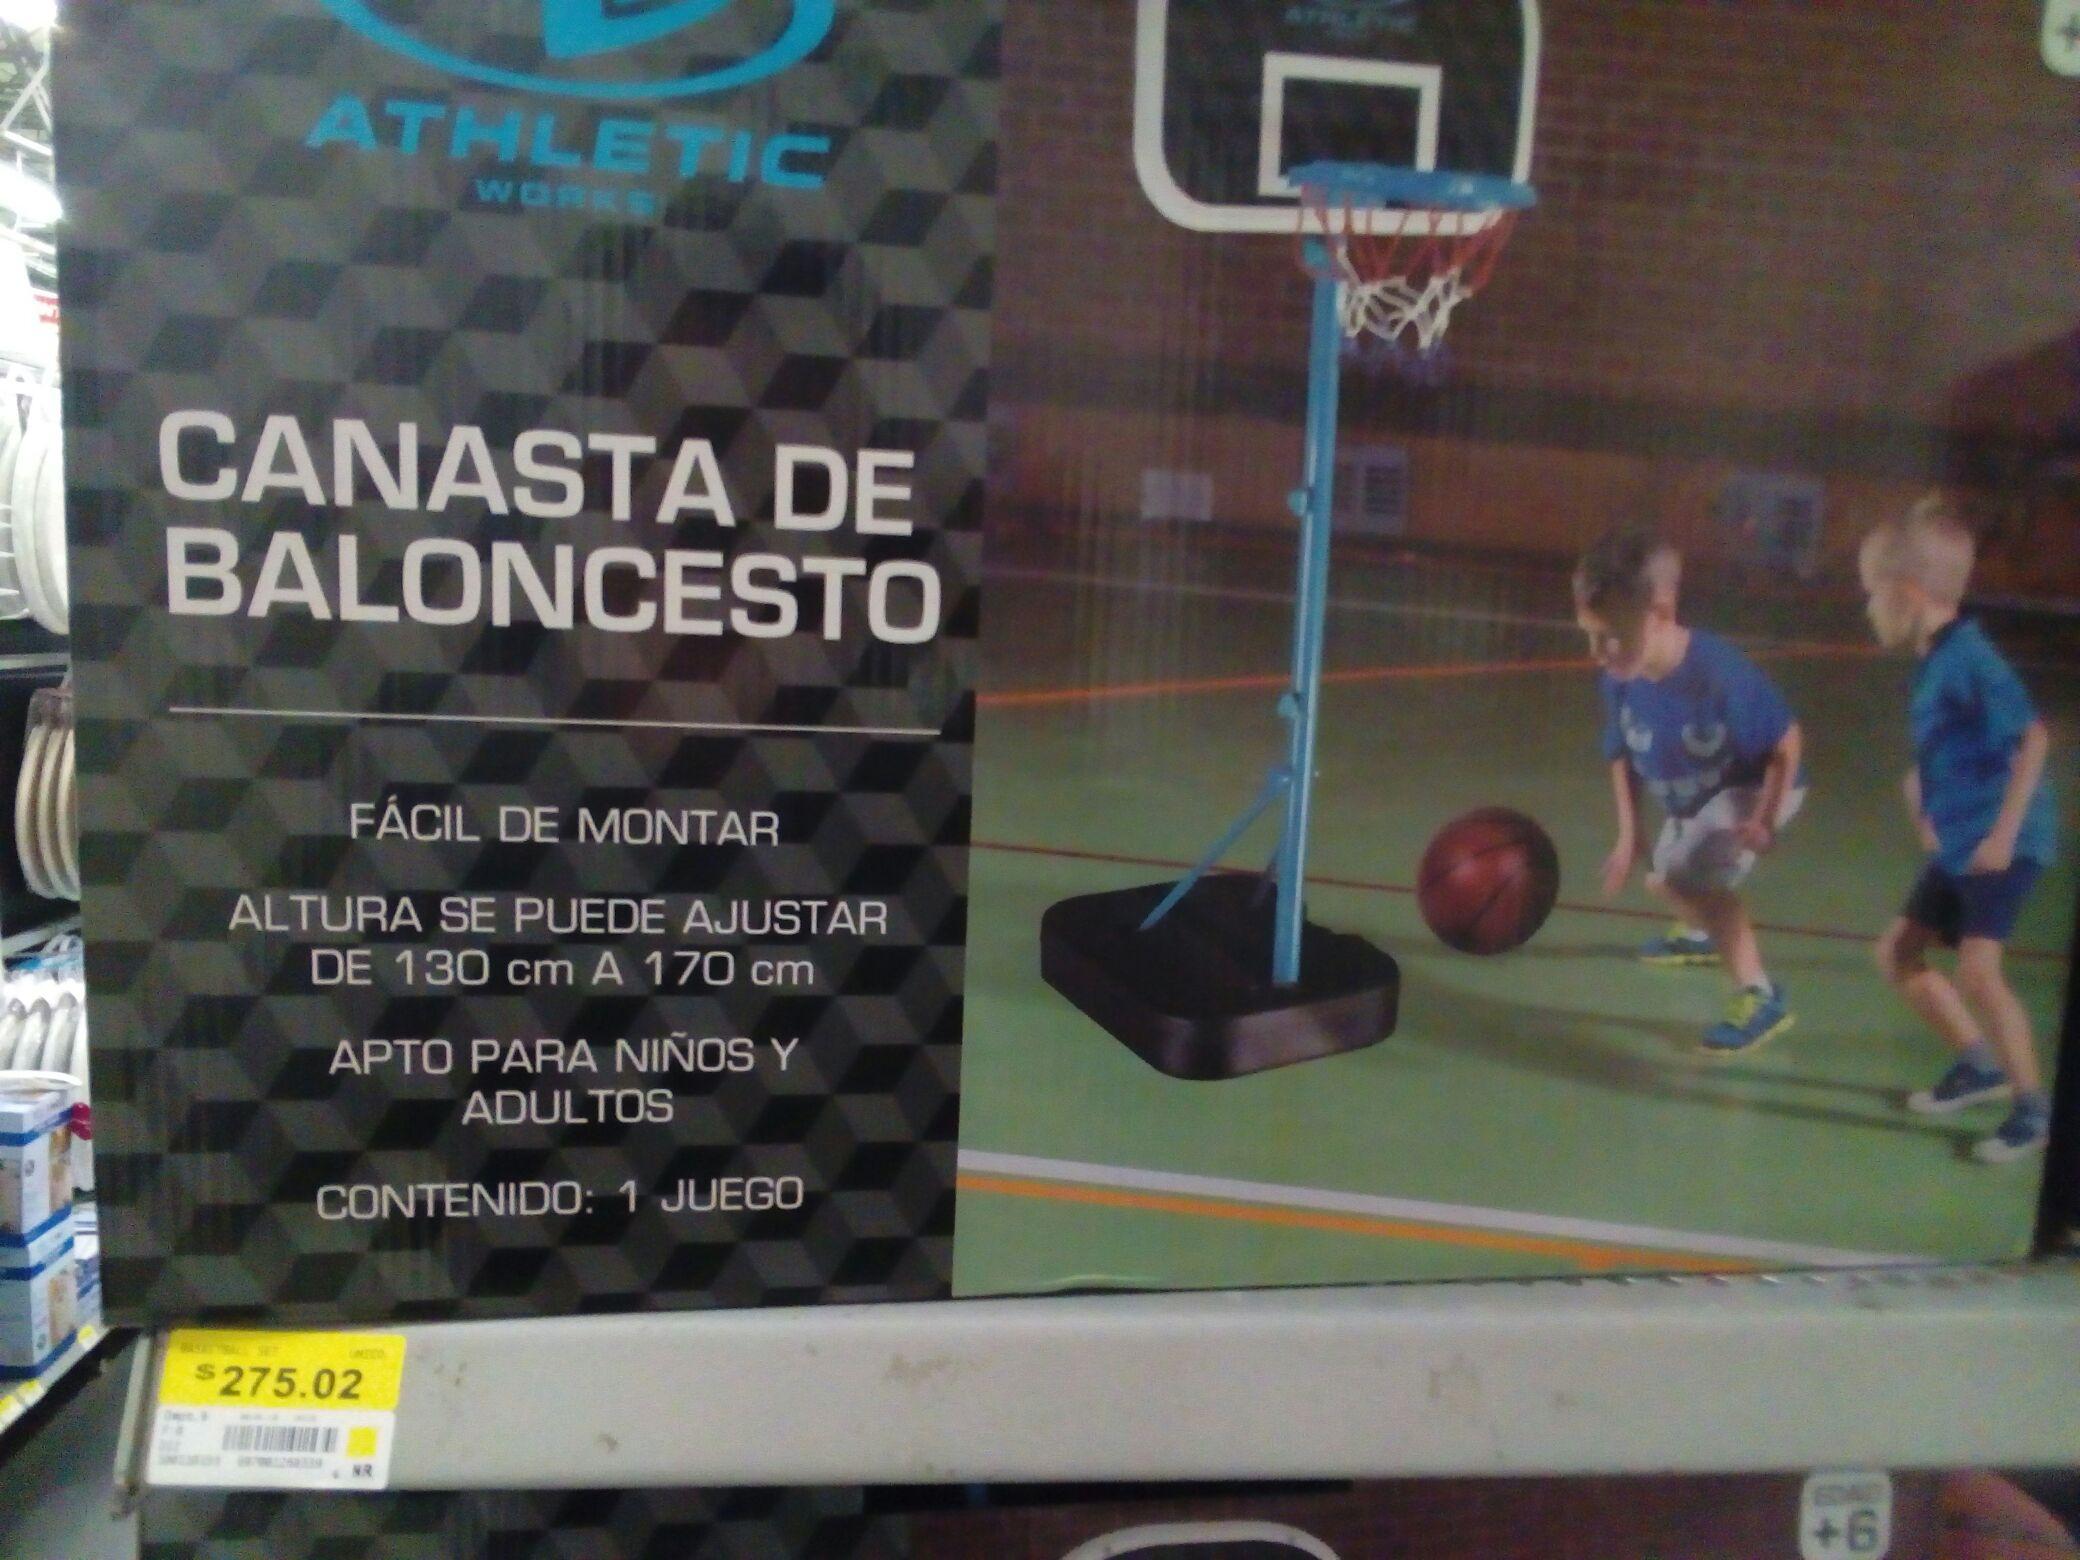 Bodega Aurrerá: Canasta de baloncesto en liquidación